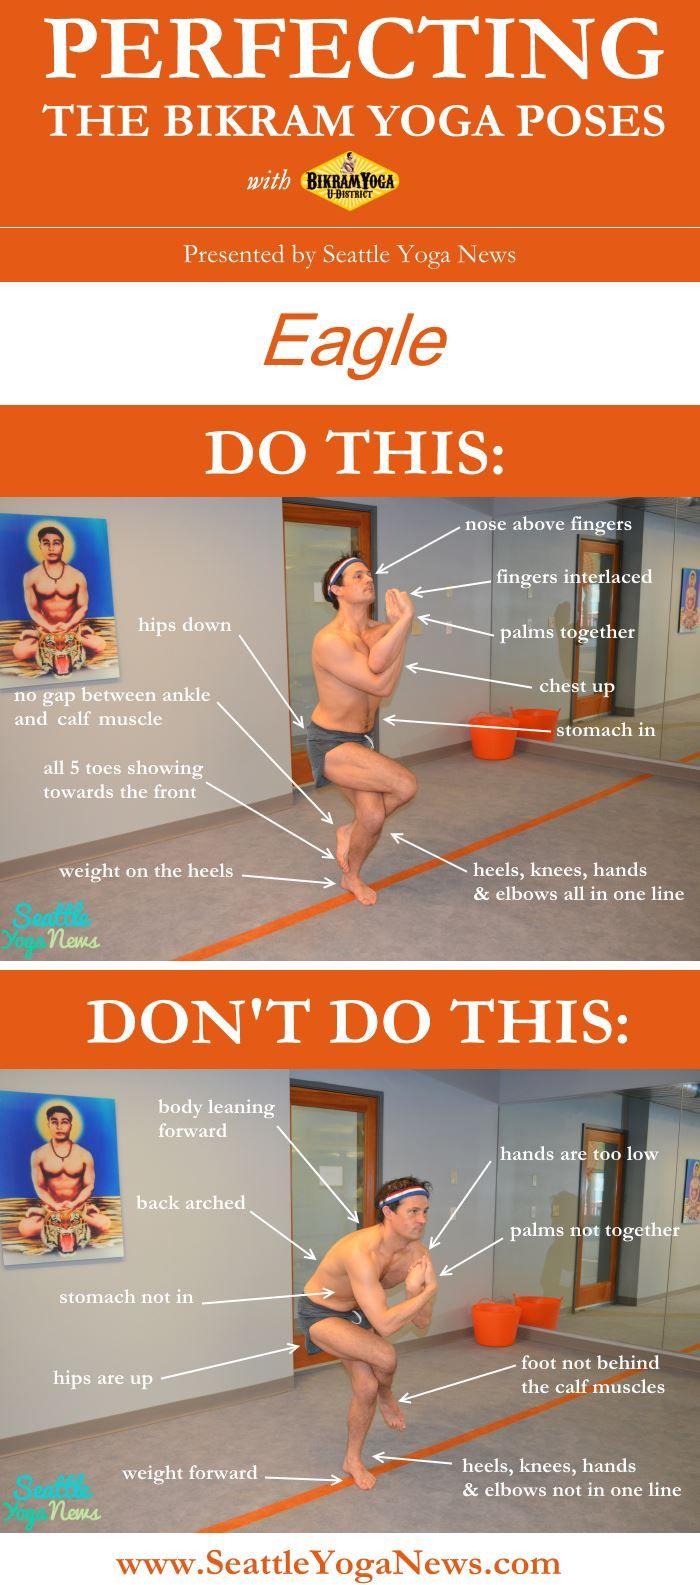 perfecting-the-bikram-yoga-poses-eagle